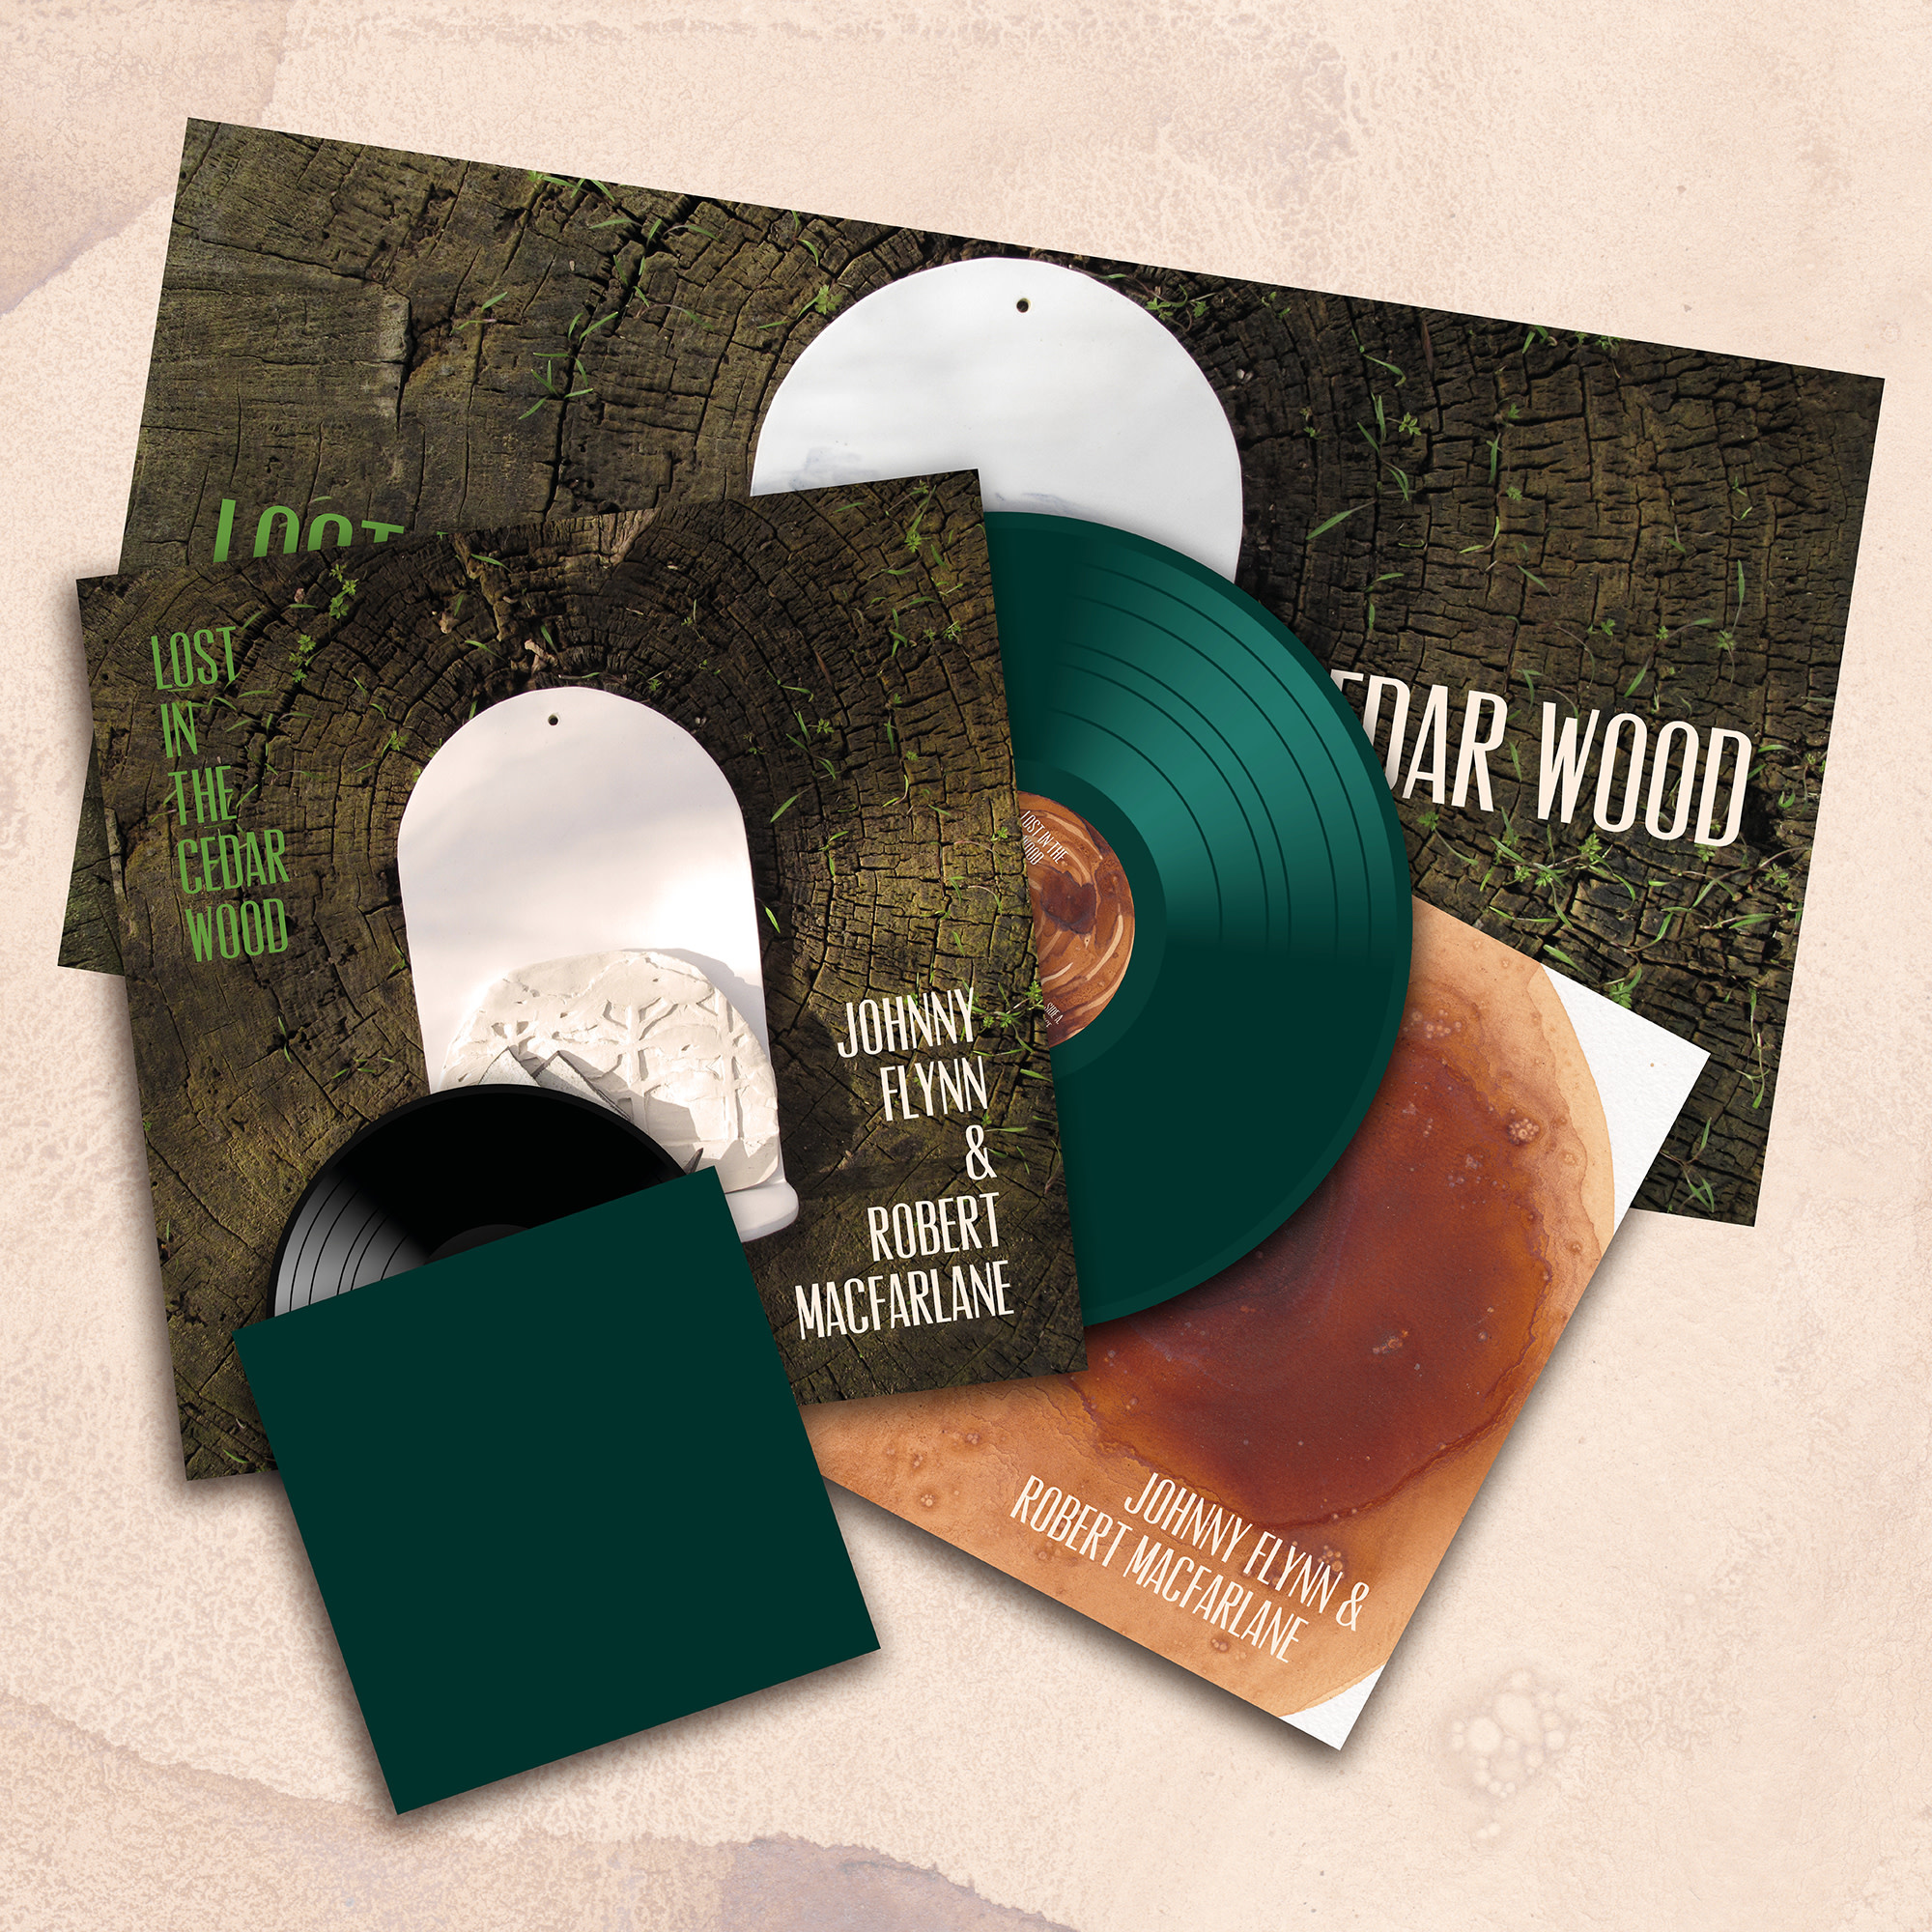 Transgressive Johnny Flynn and Robert Macfarlane - Lost In The Cedar Wood (Dinked Edition)